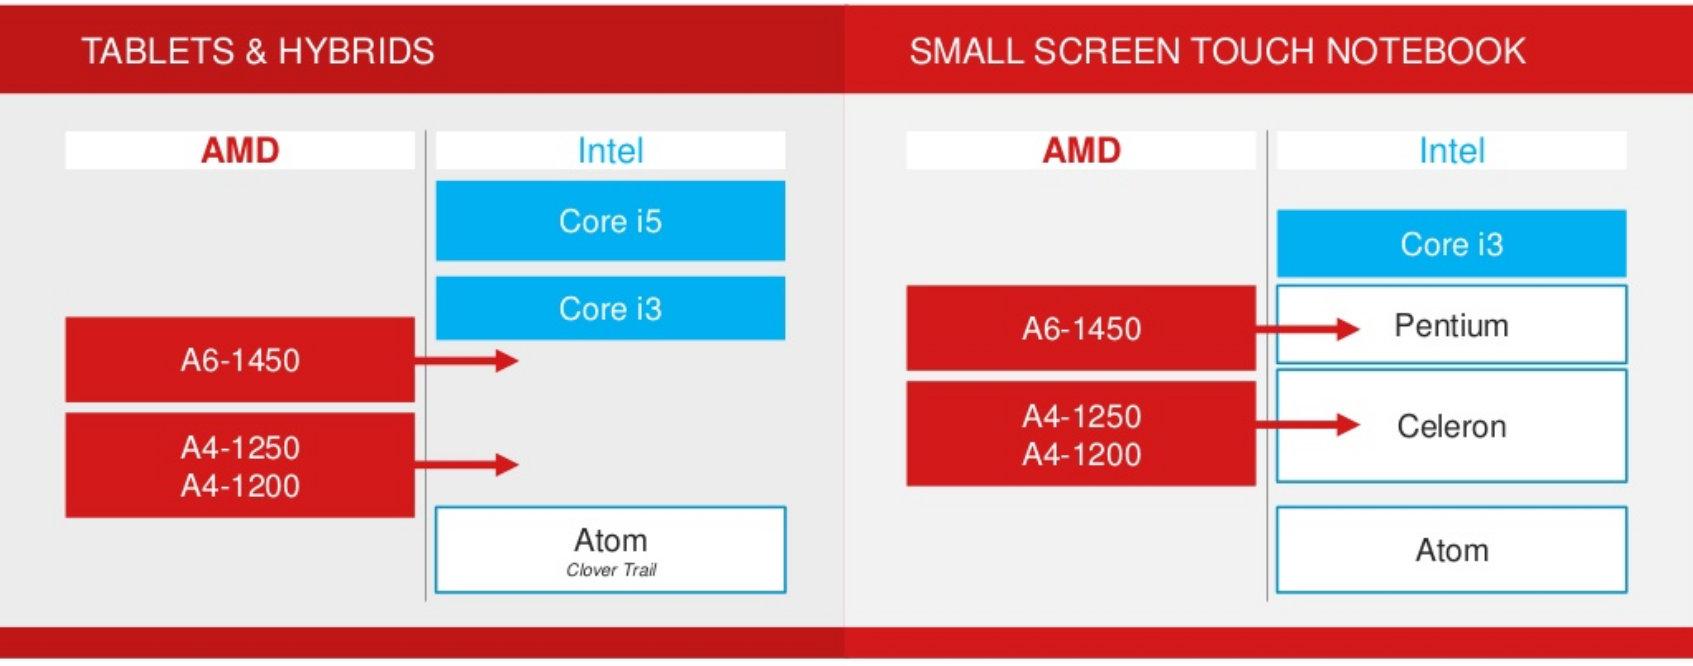 AMD vs. Intel Processor Differences